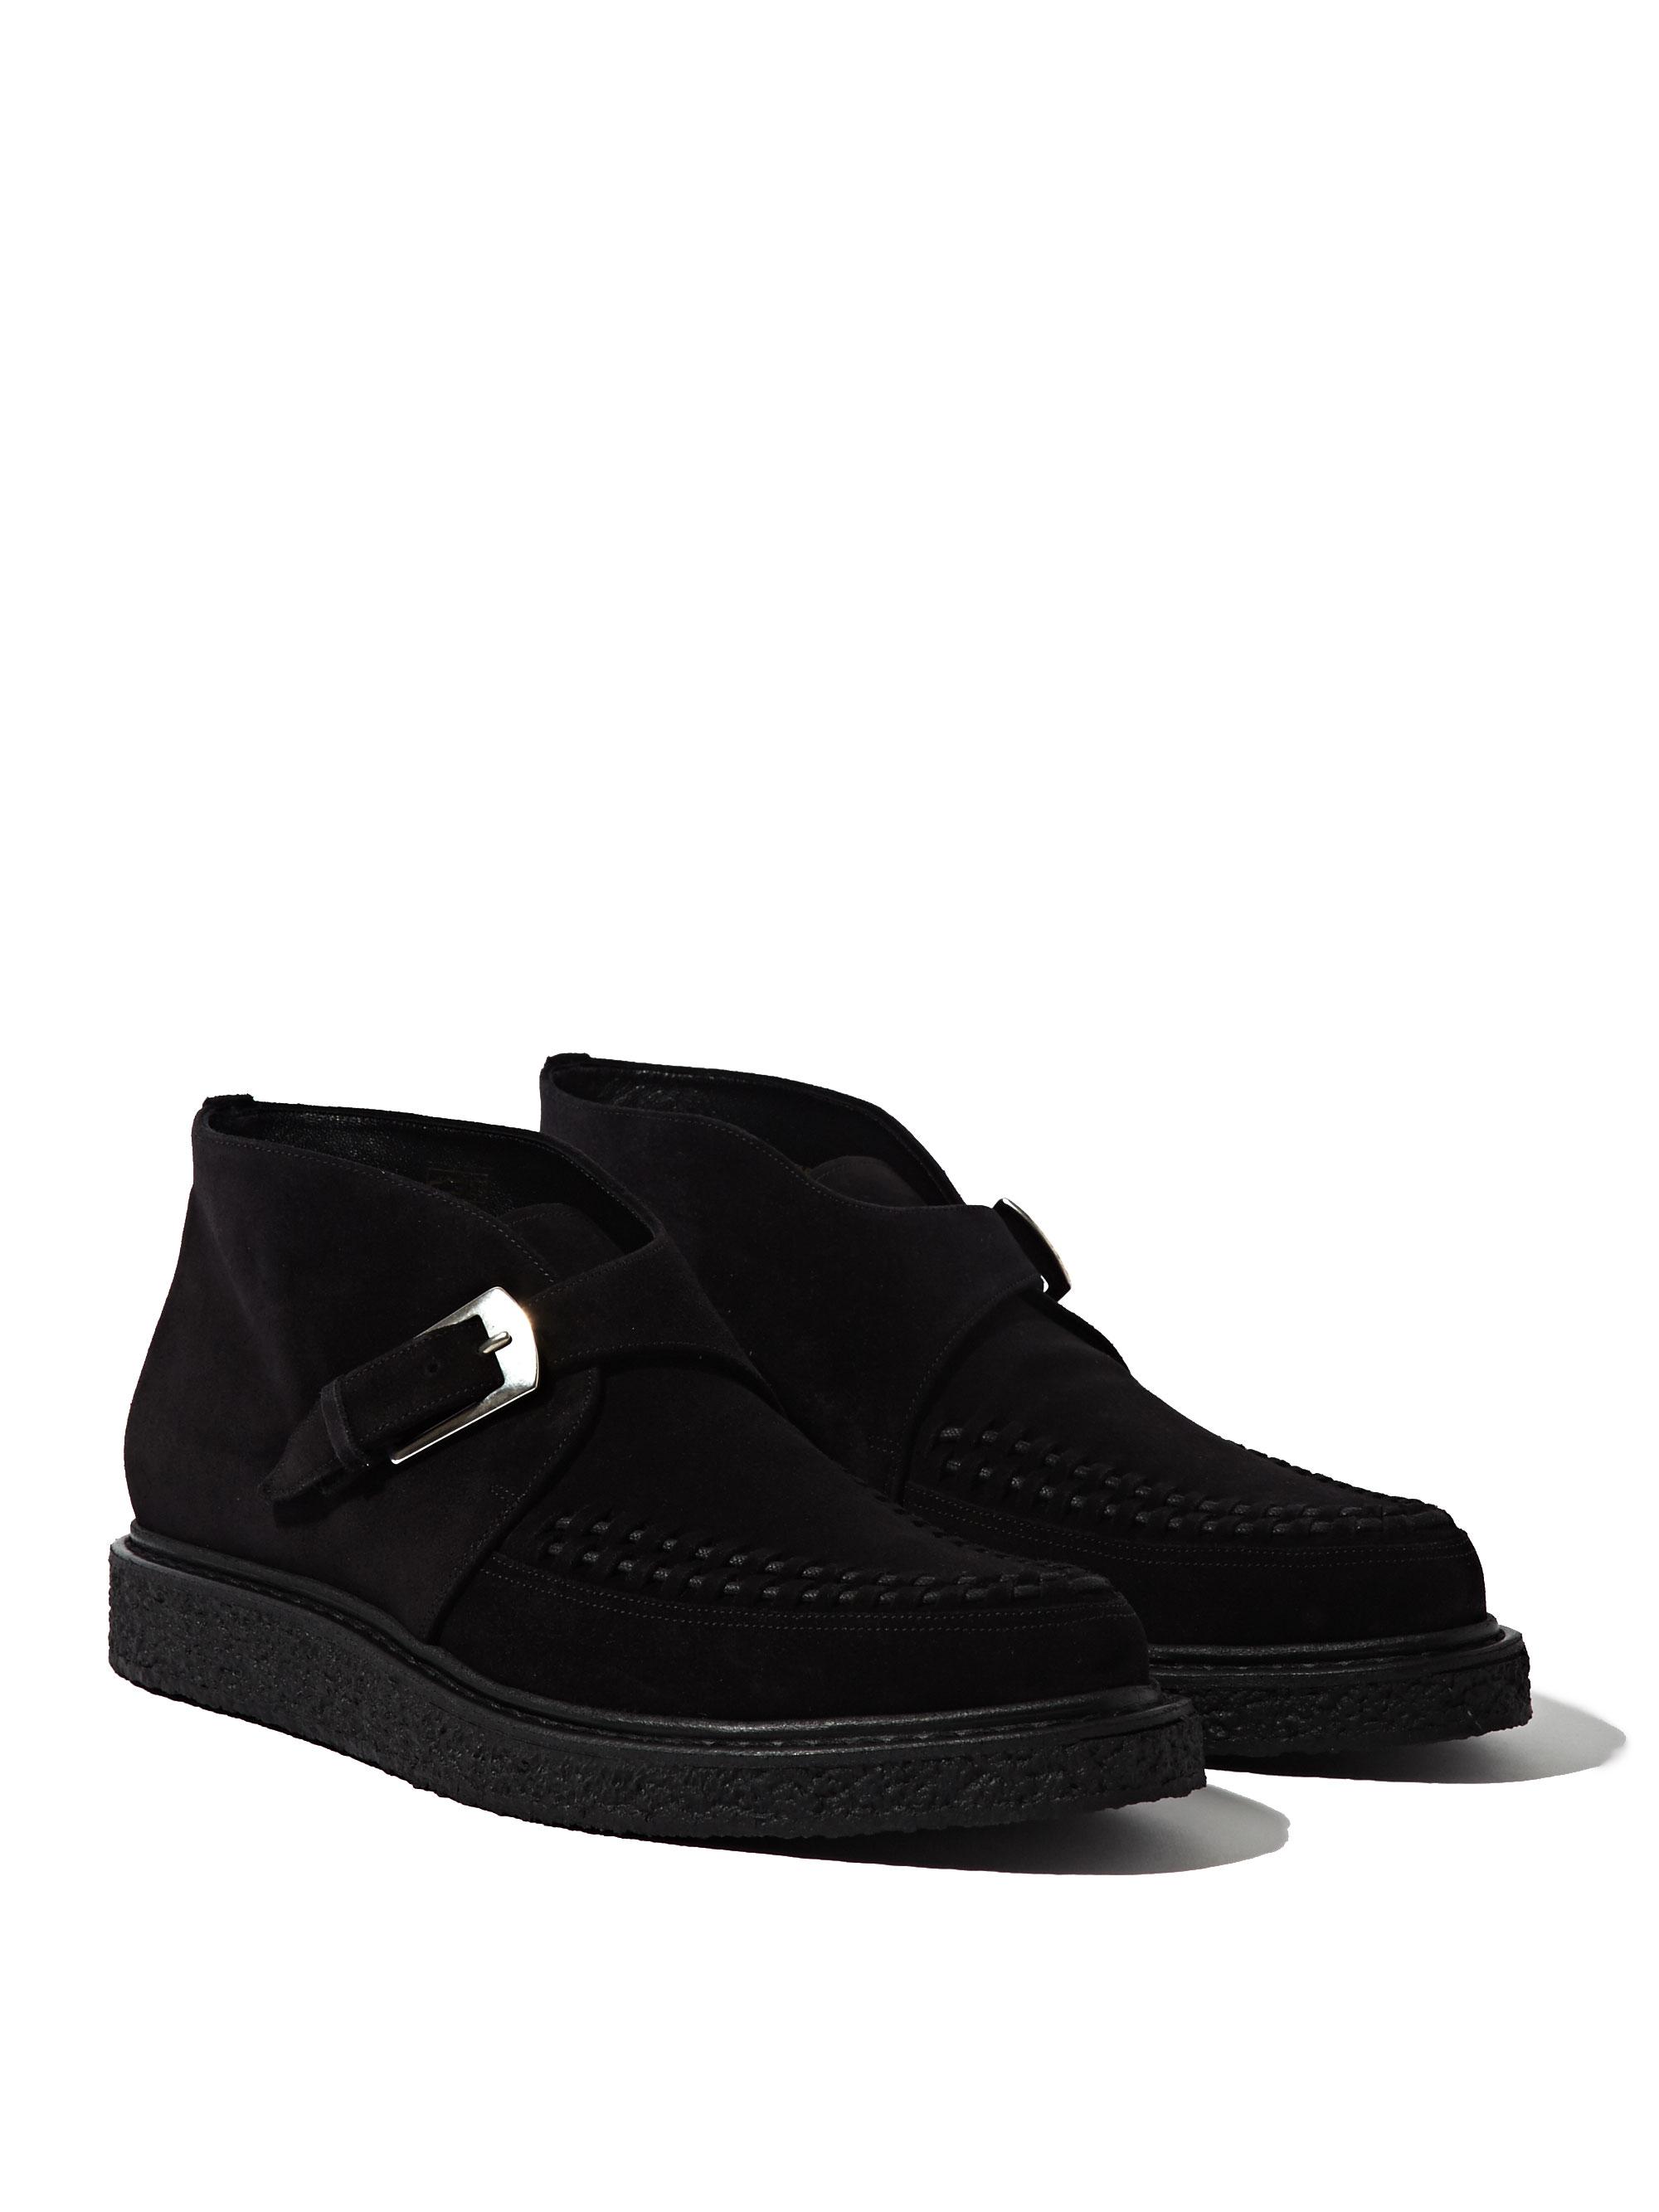 Mens Black Wedge Shoes